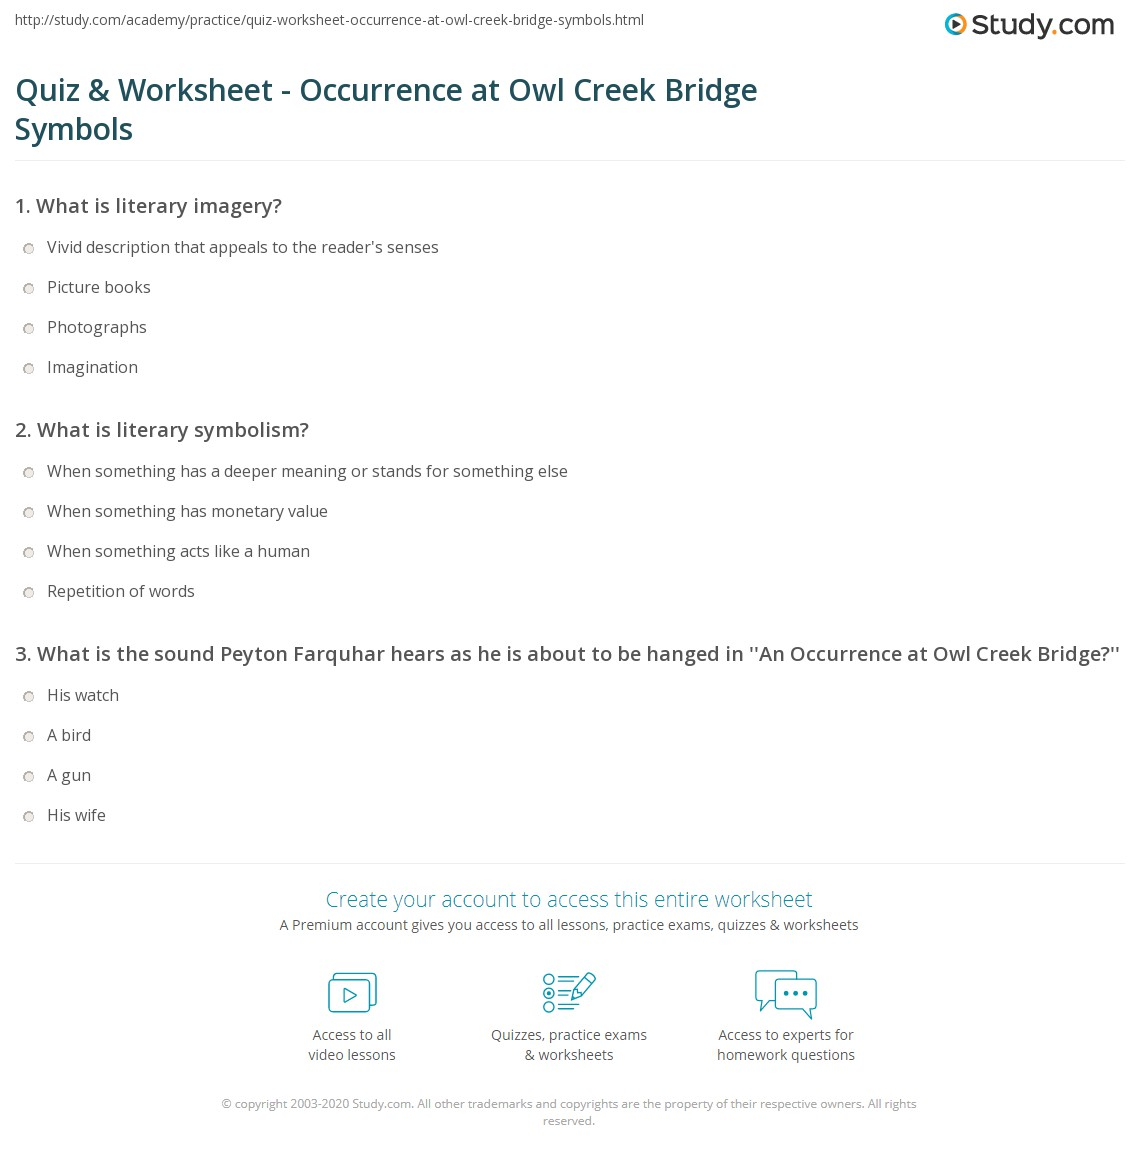 An Occurrence At Owl Creek Bridge Worksheet